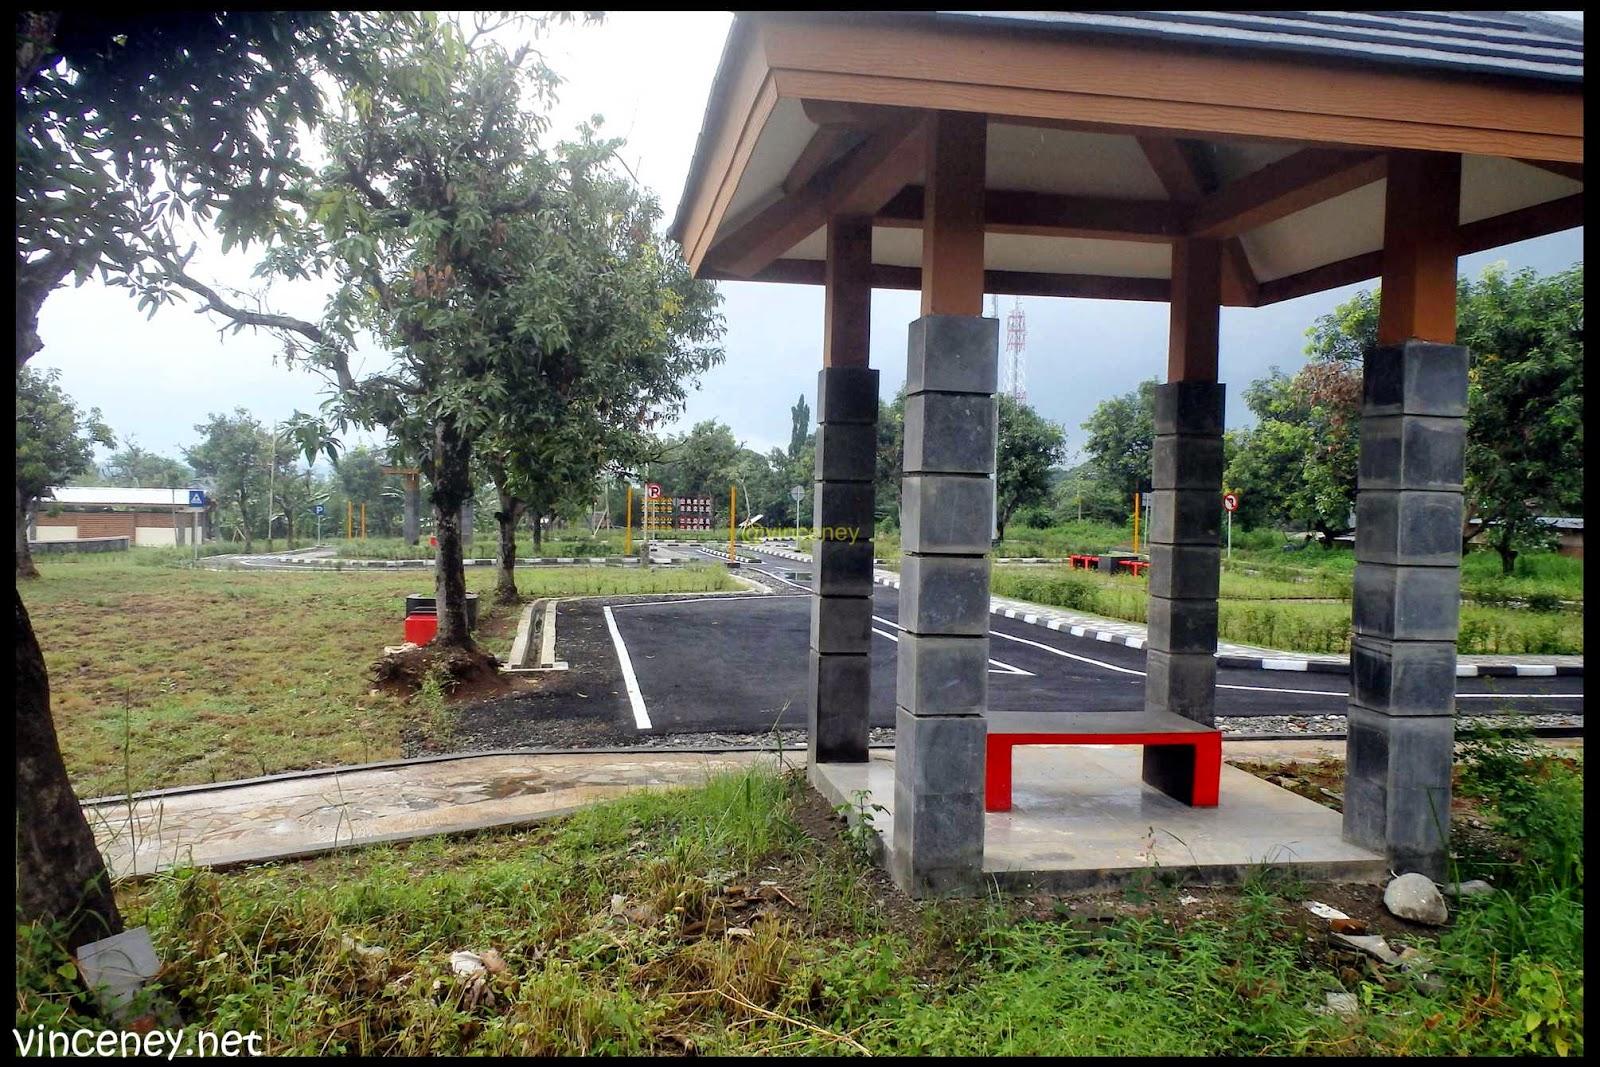 Explore Semarang Barat Naik Brt Vinceney Dot Net Tombo Gelo